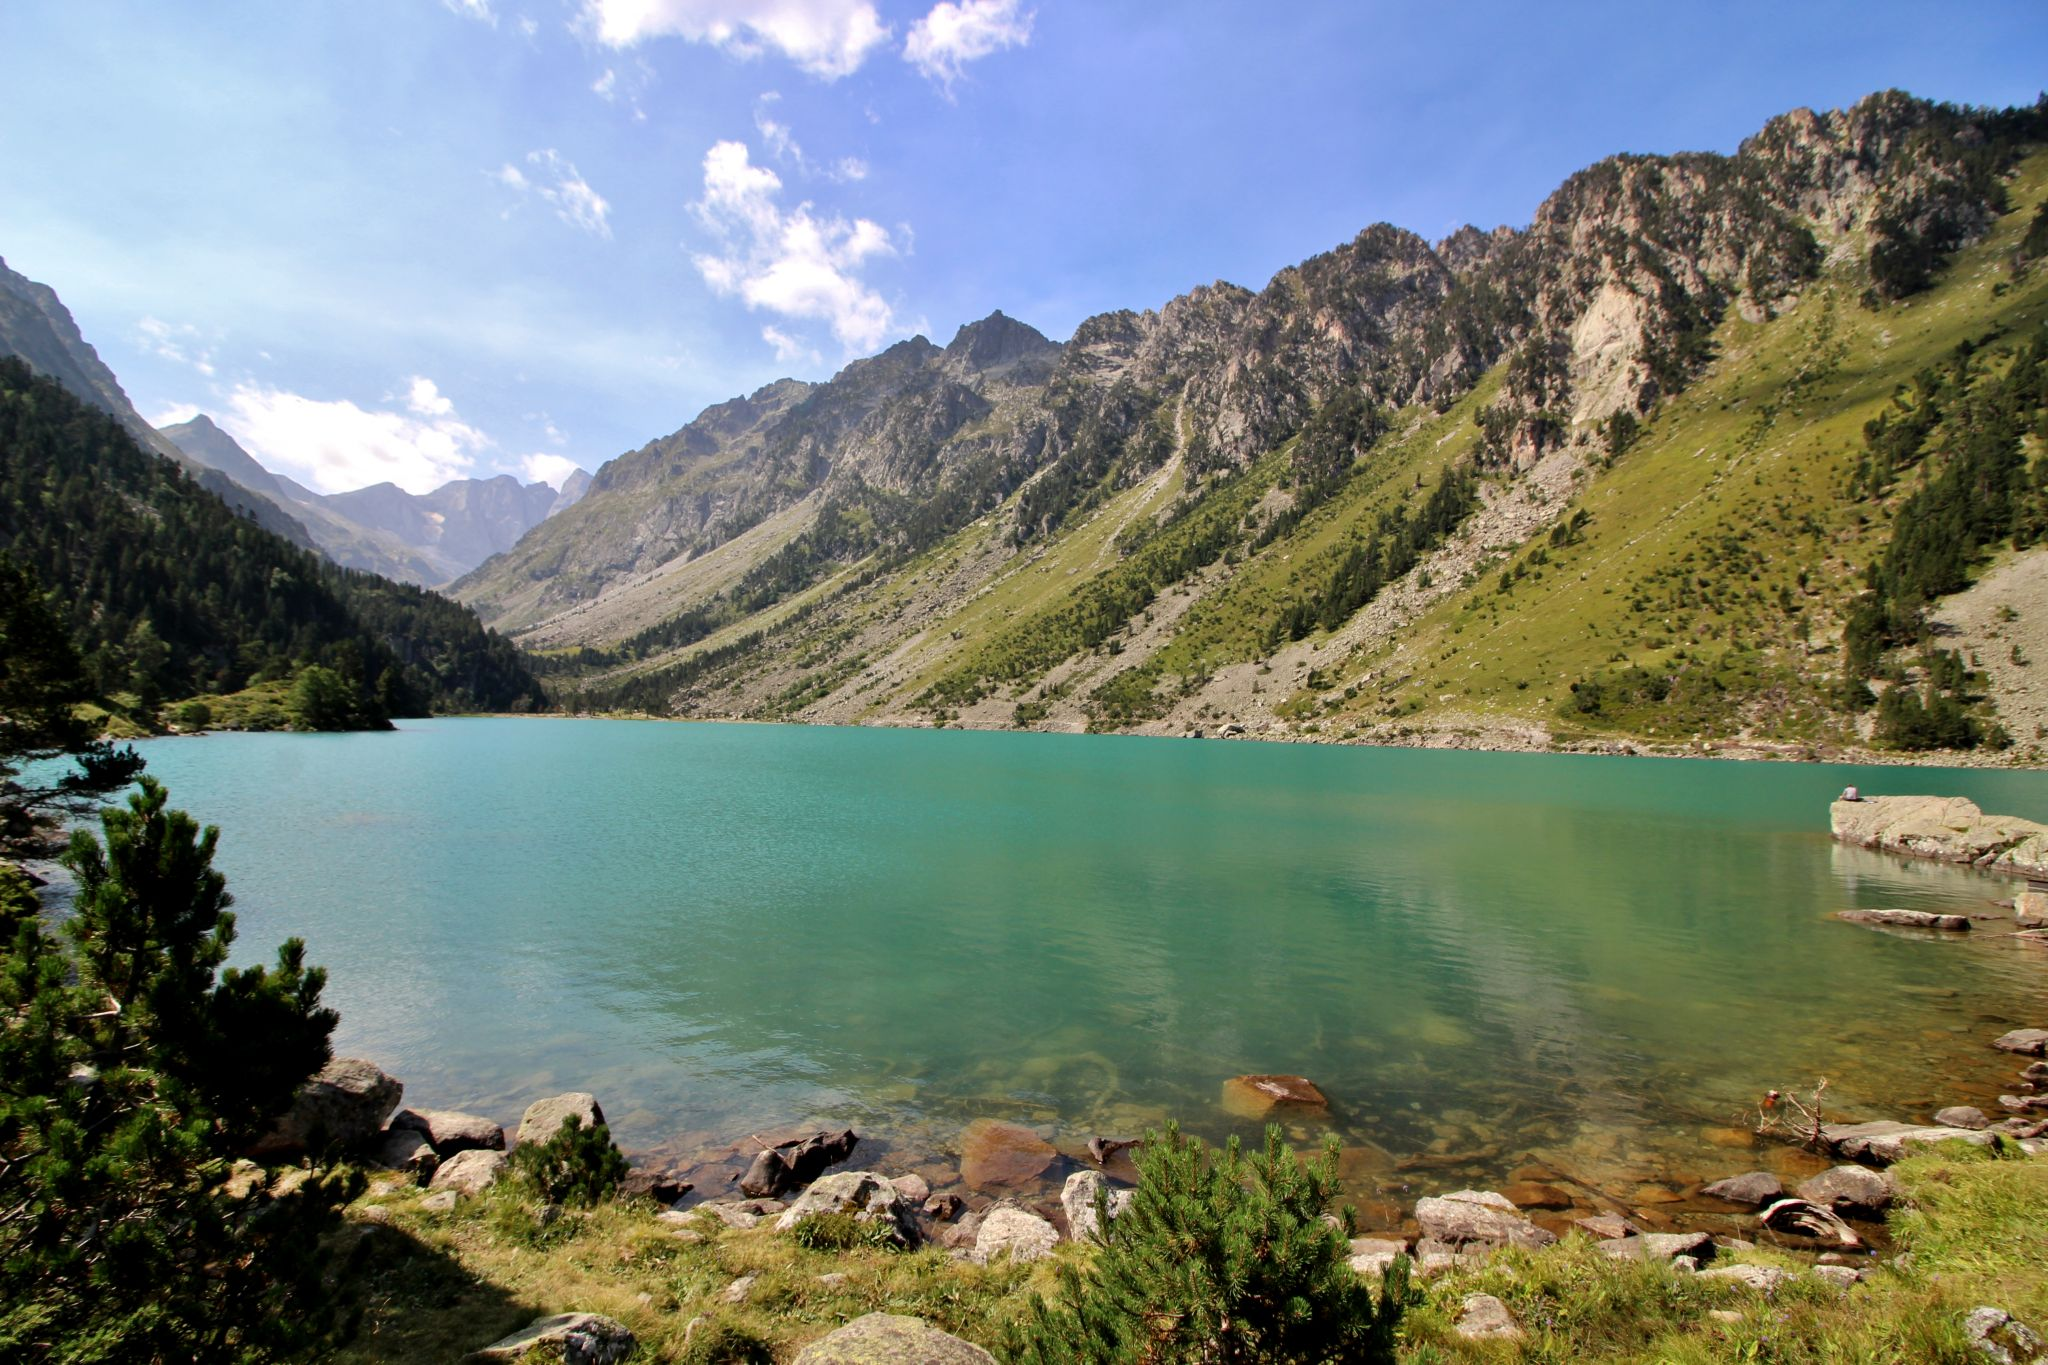 Lac de Gaube, France